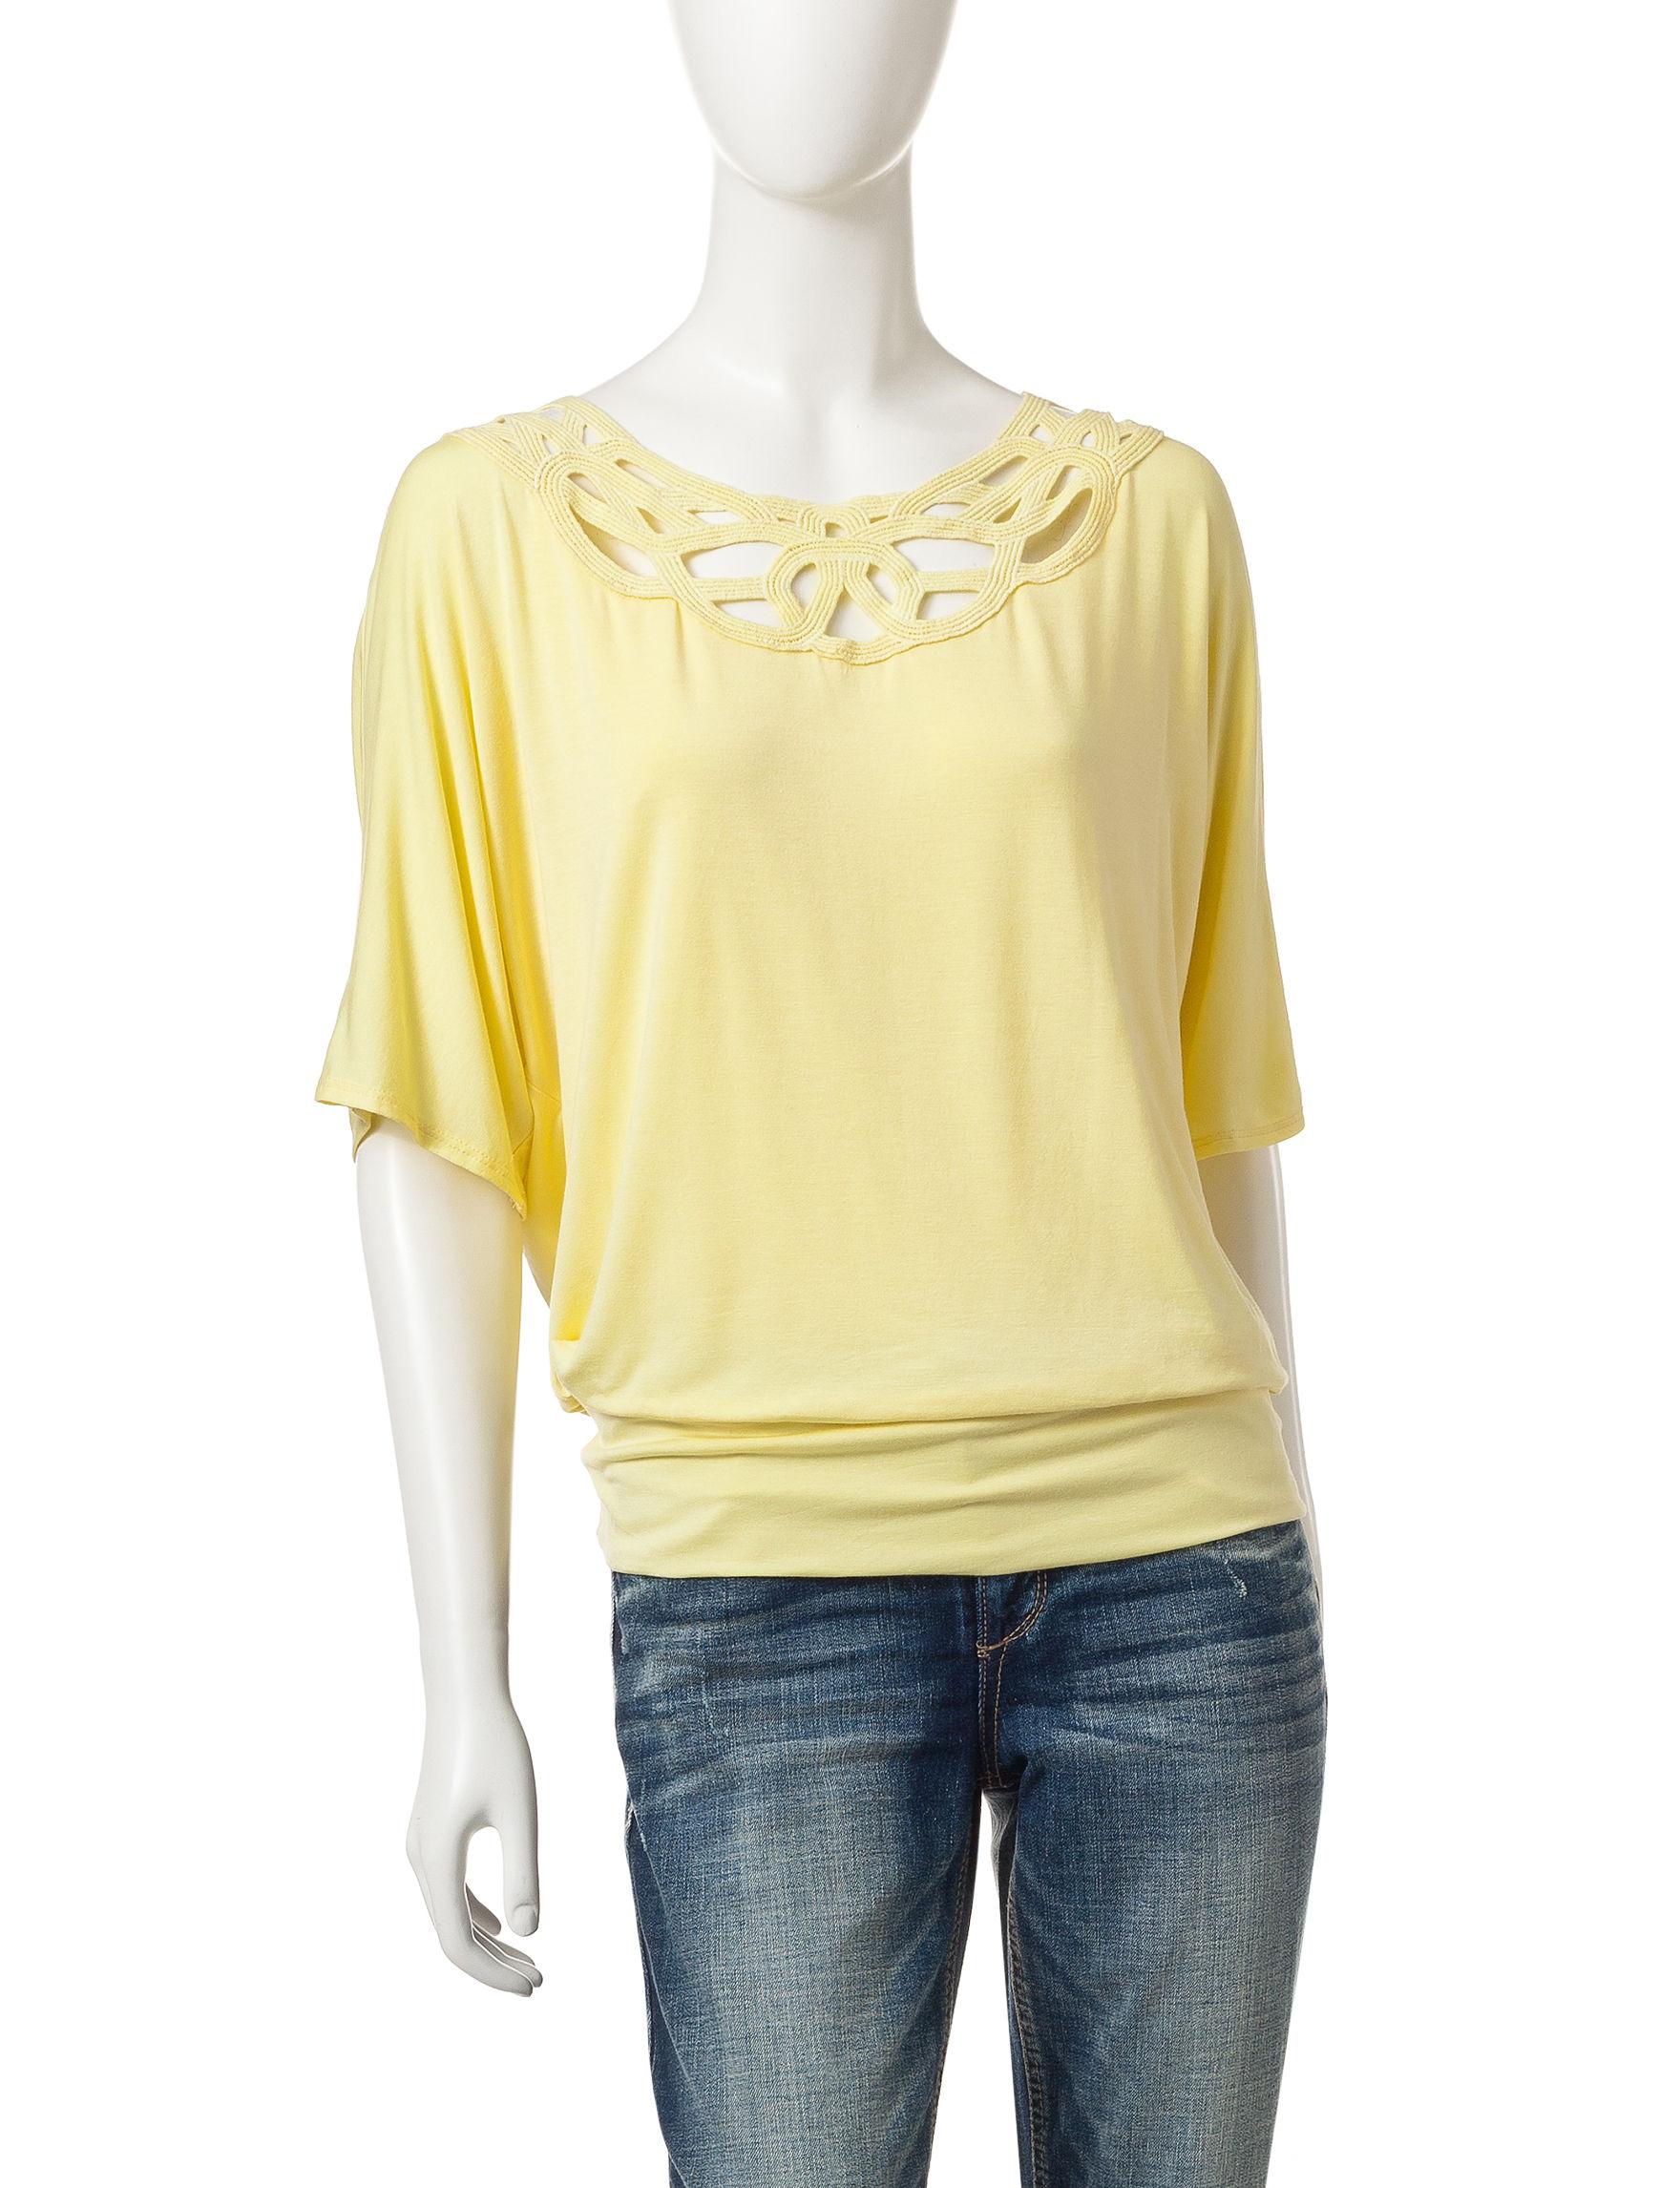 A. Byer Butter Shirts & Blouses